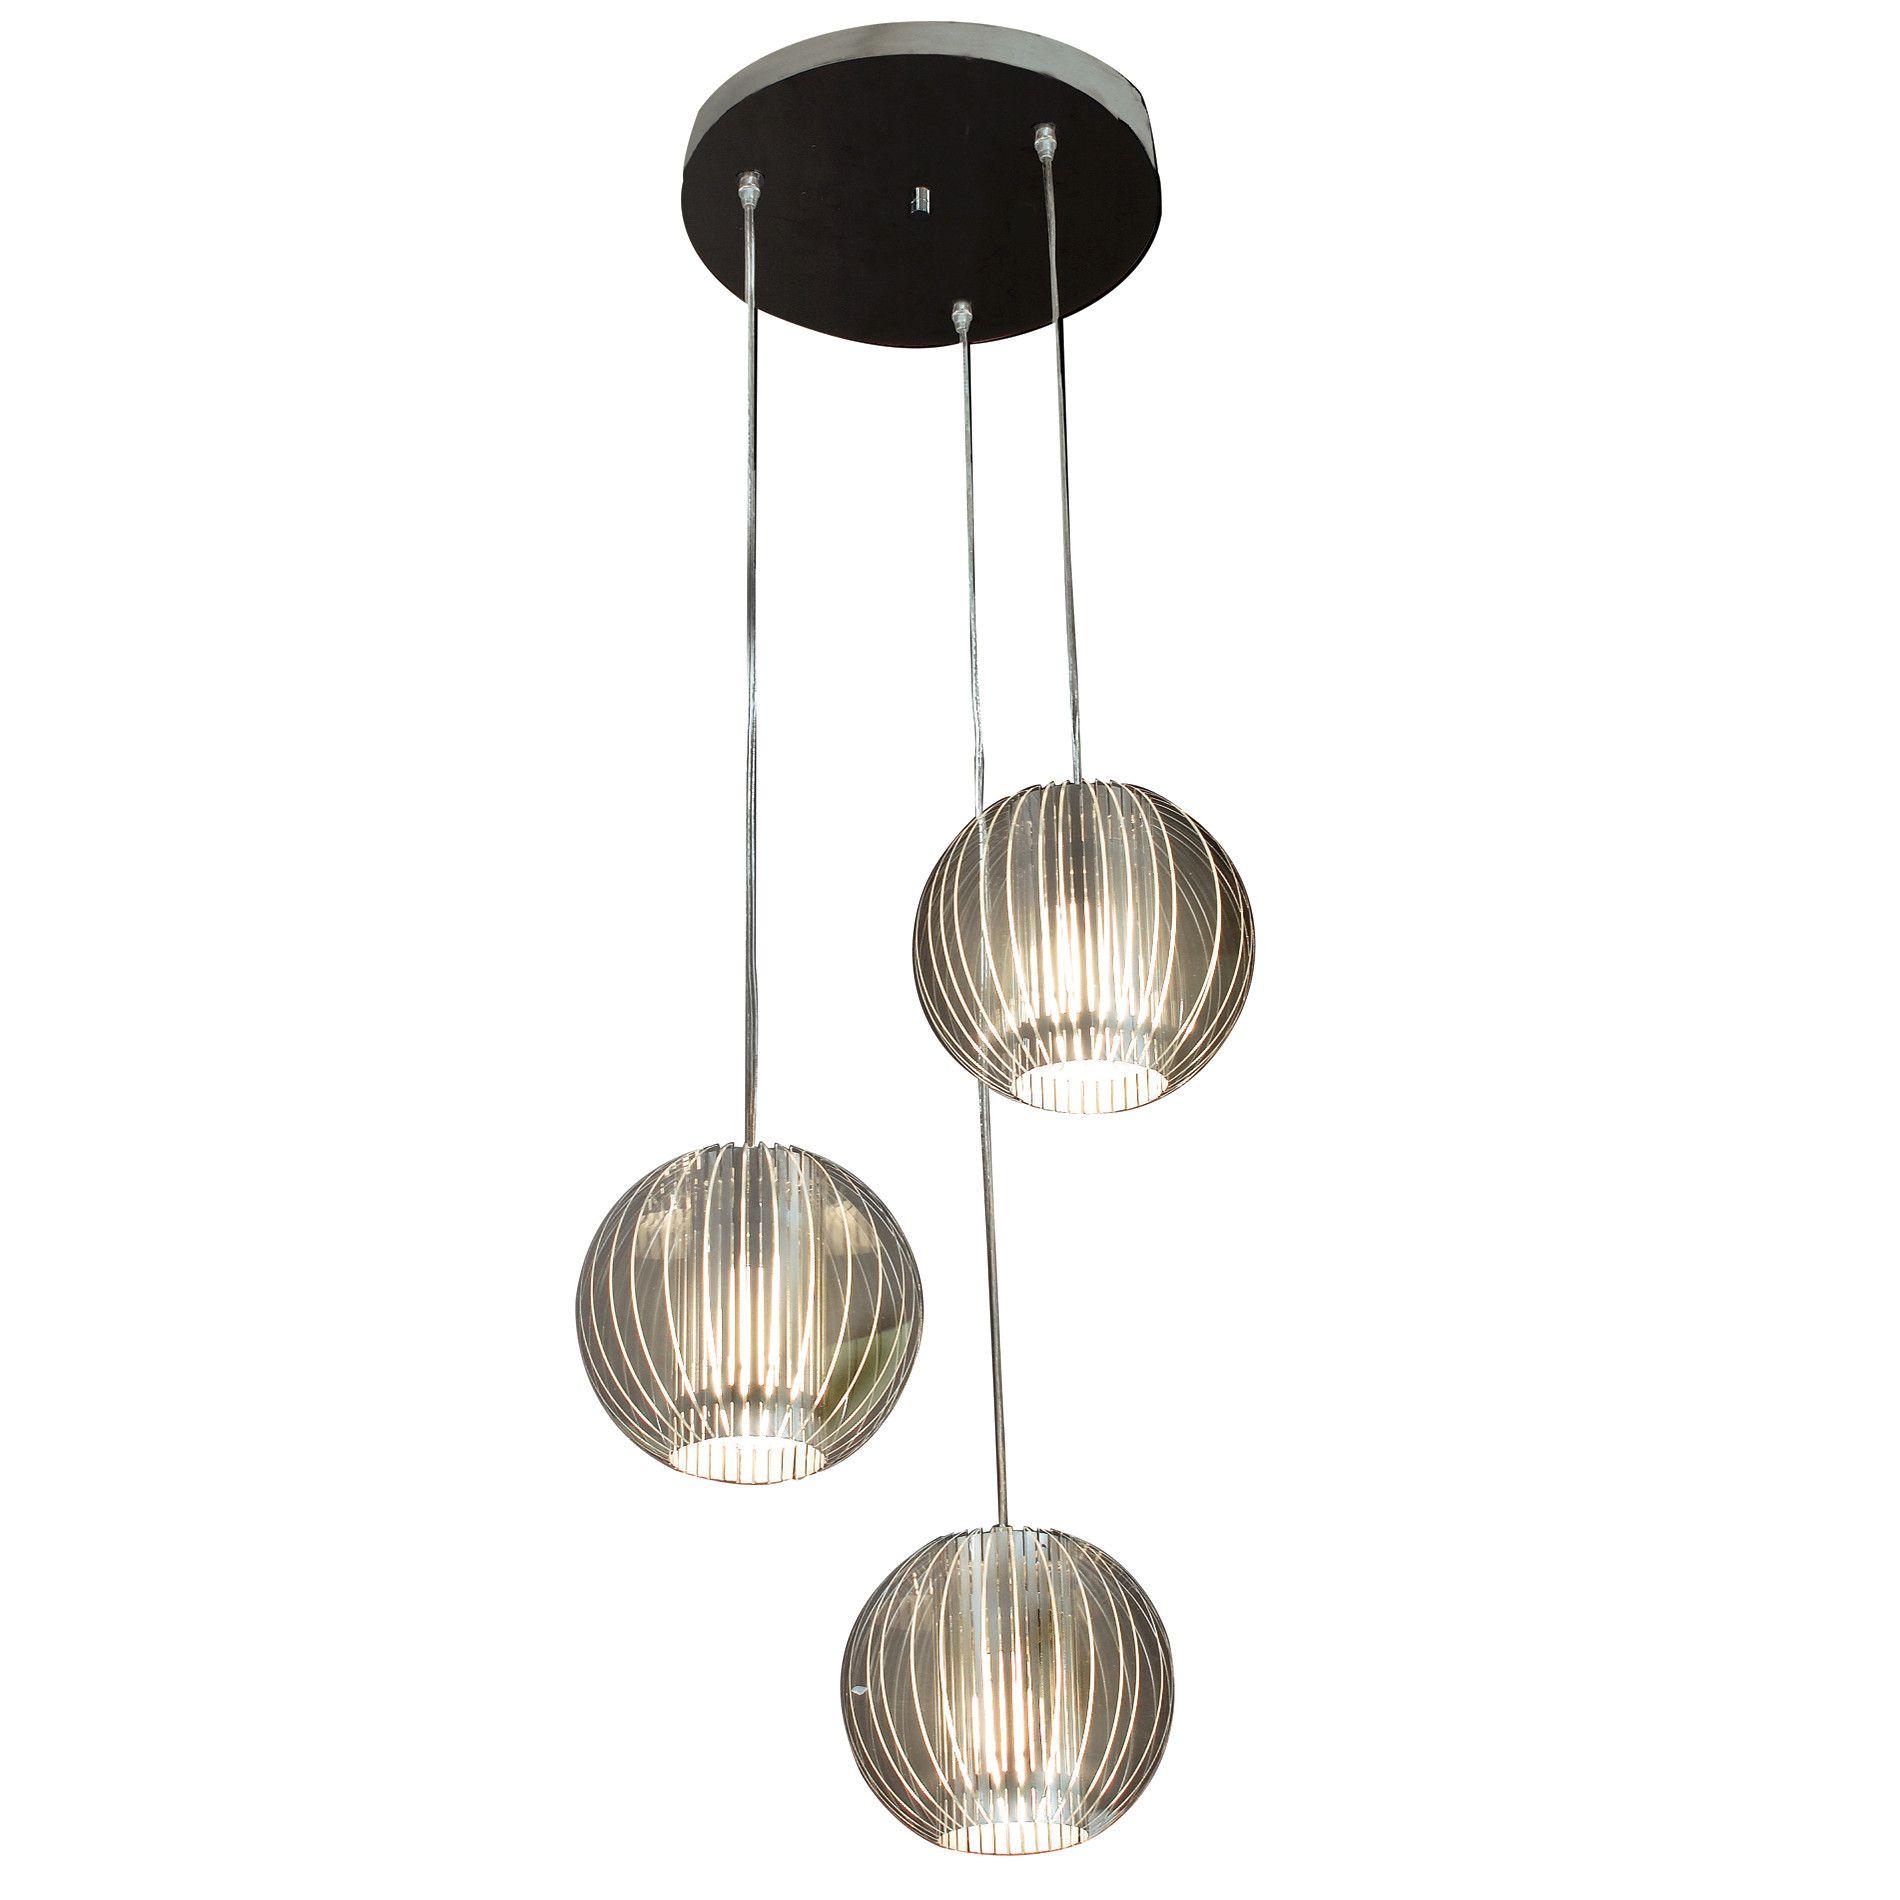 Trend lighting corp phoenix light globe pendant u reviews